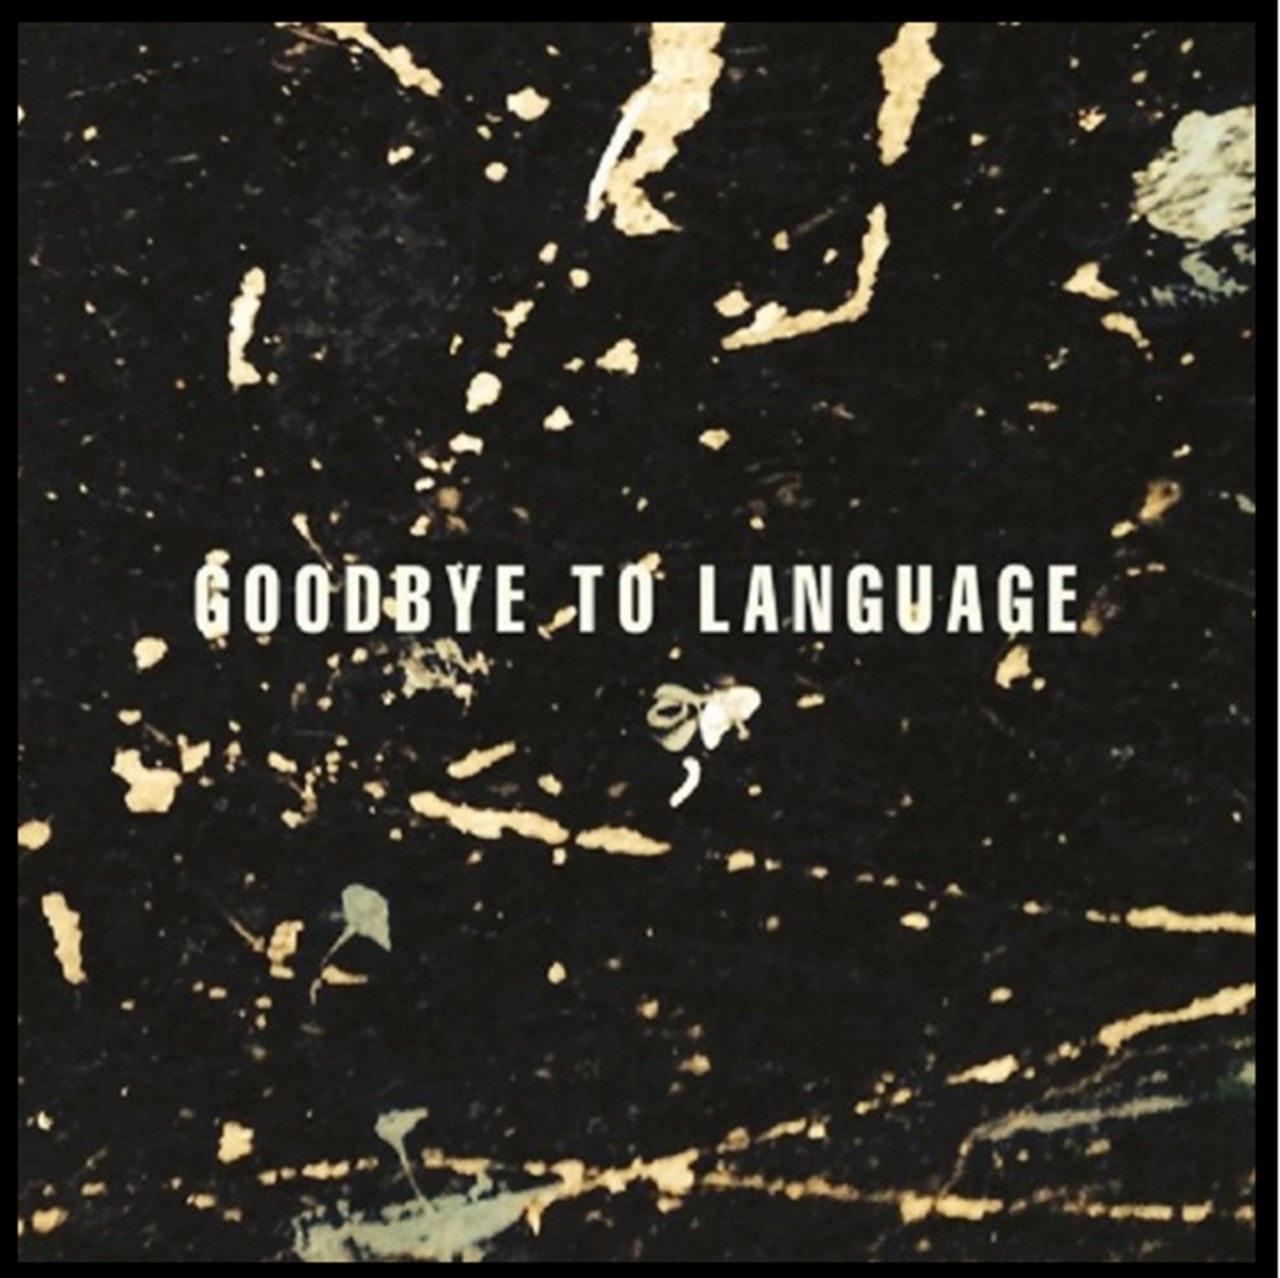 Goodbye to Language - 1